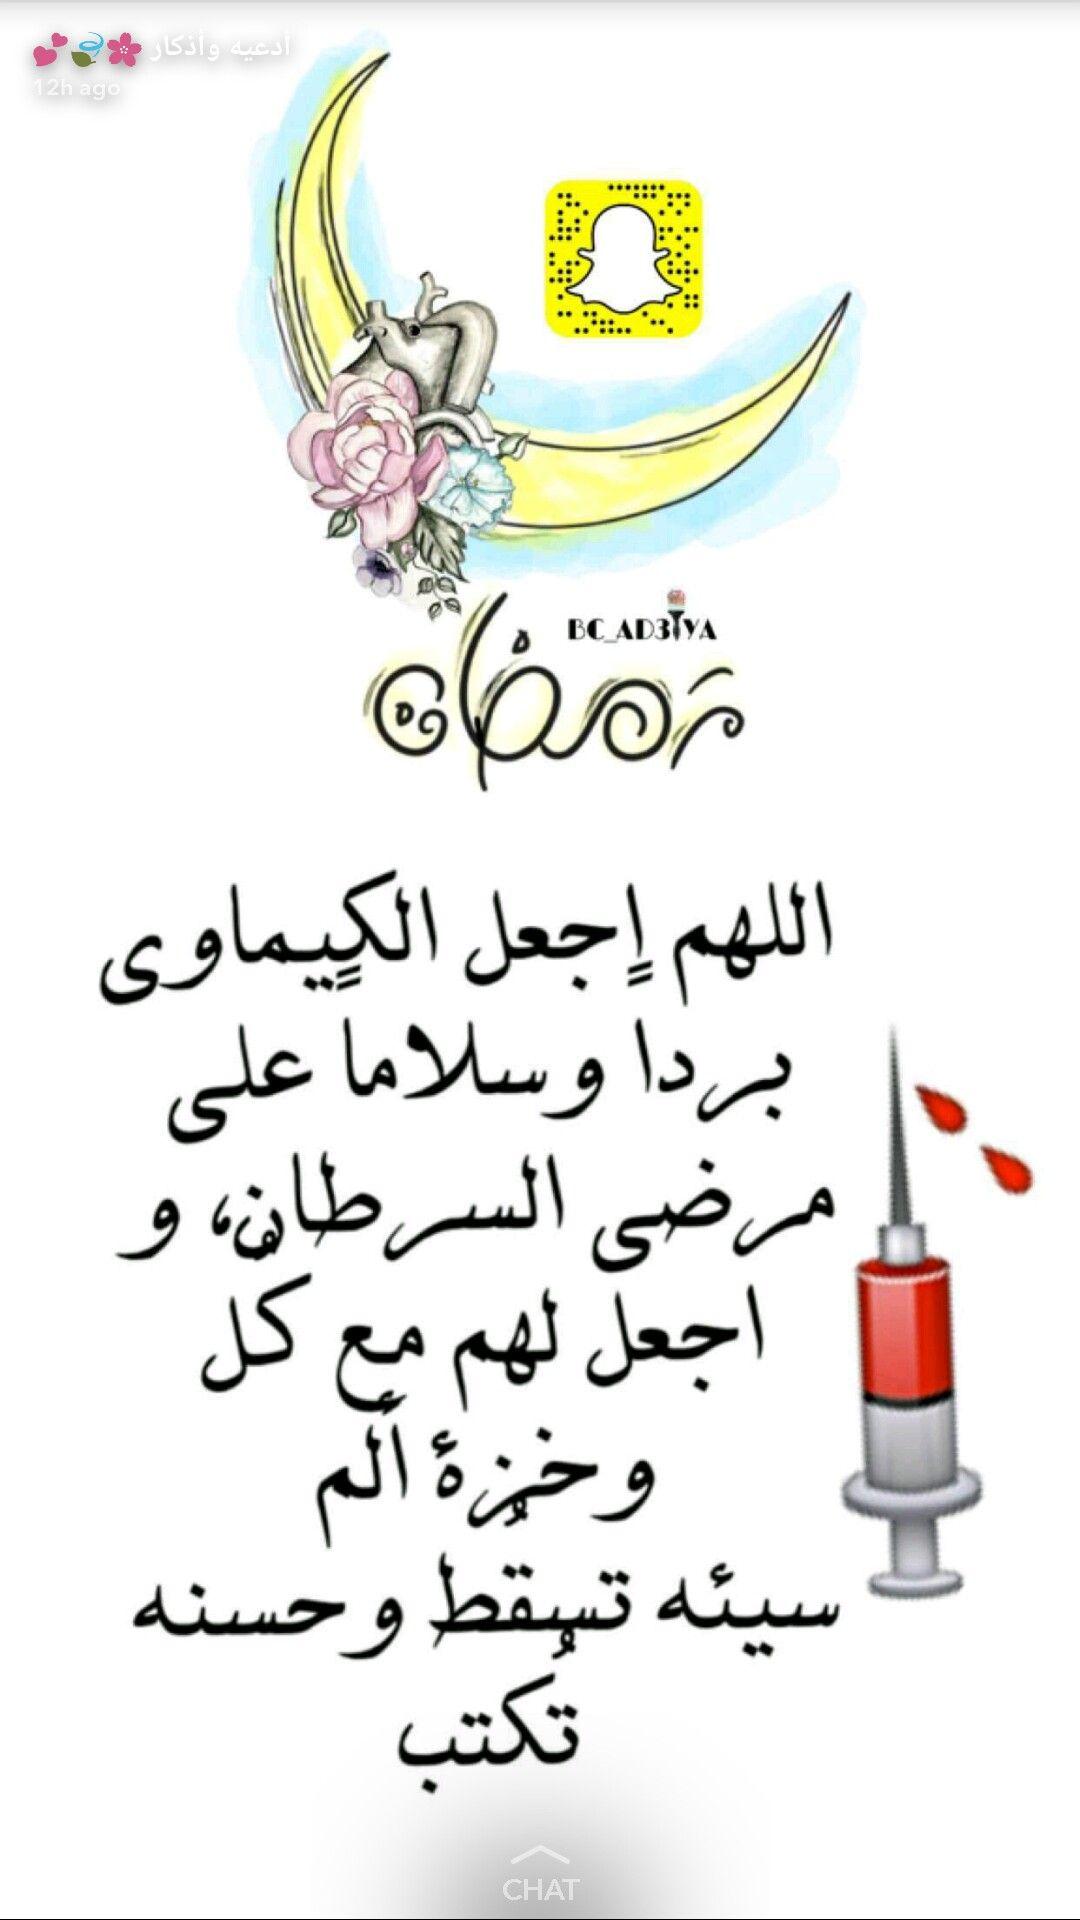 Pin By Kasmorina Aisha On دعاء Calligraphy Arabic Calligraphy